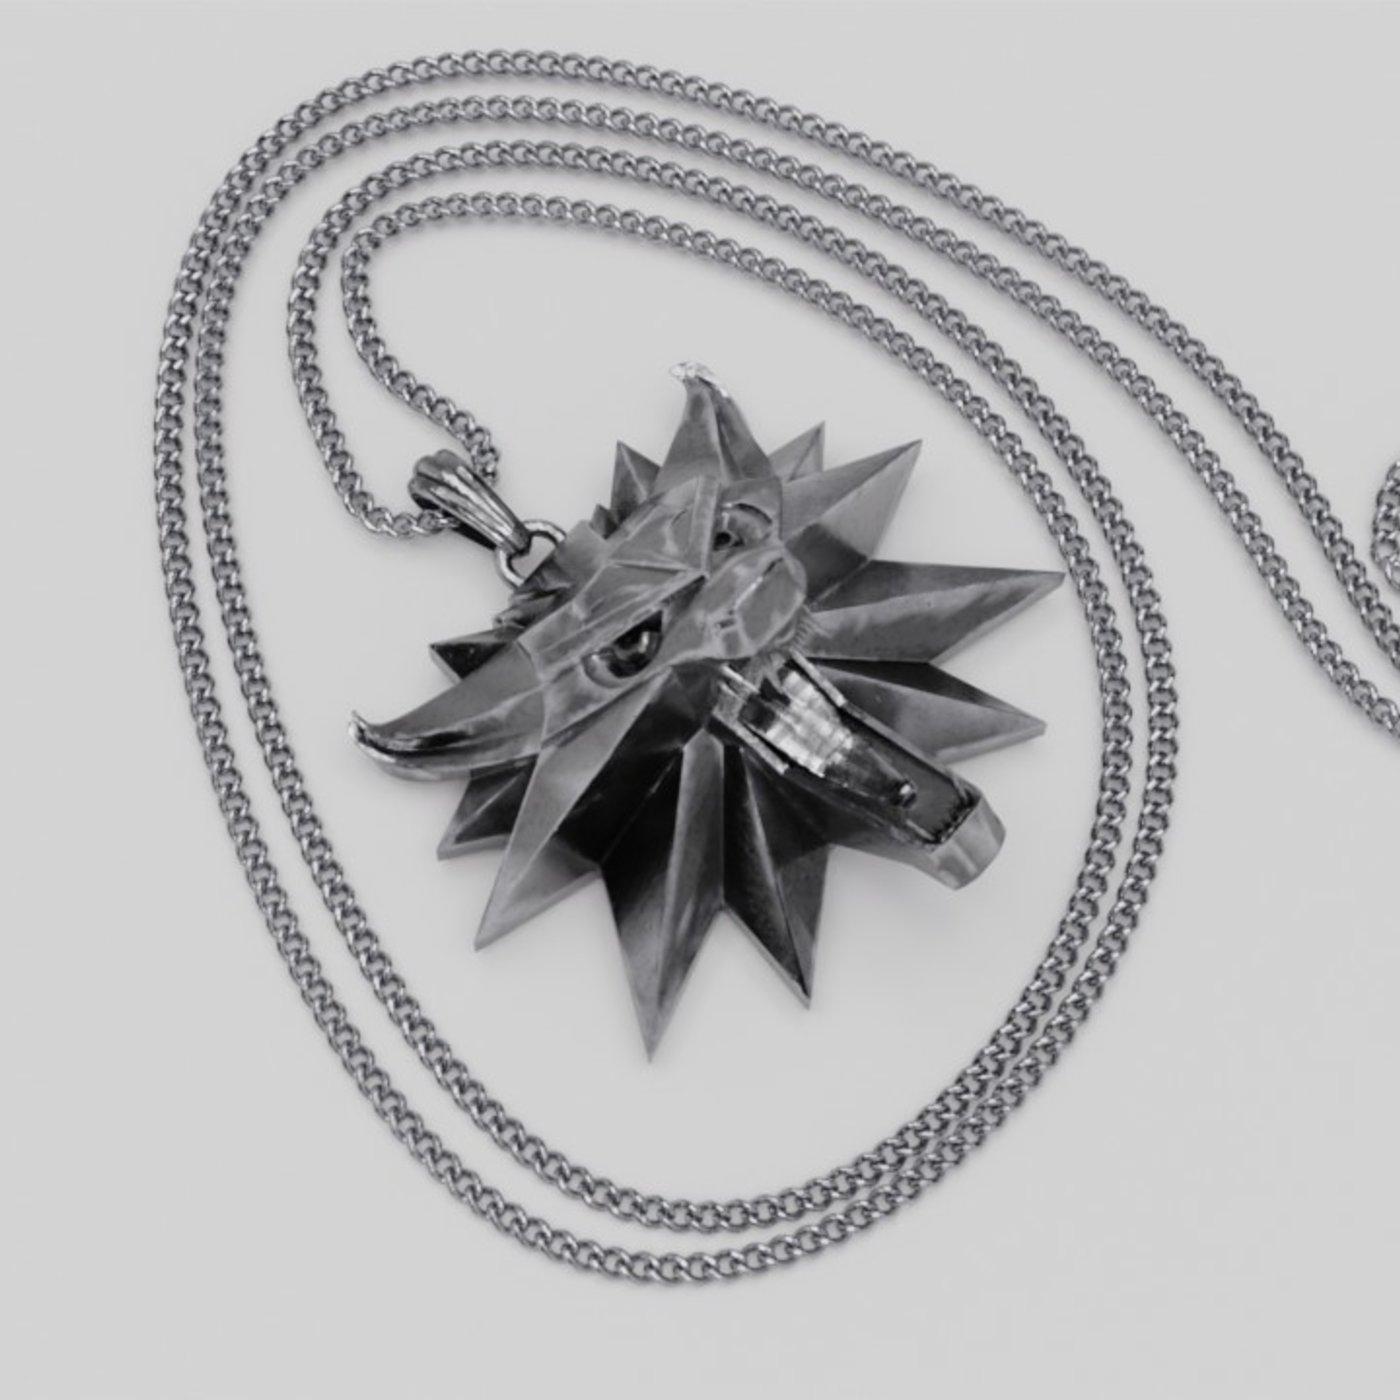 Witcher medallion pendant